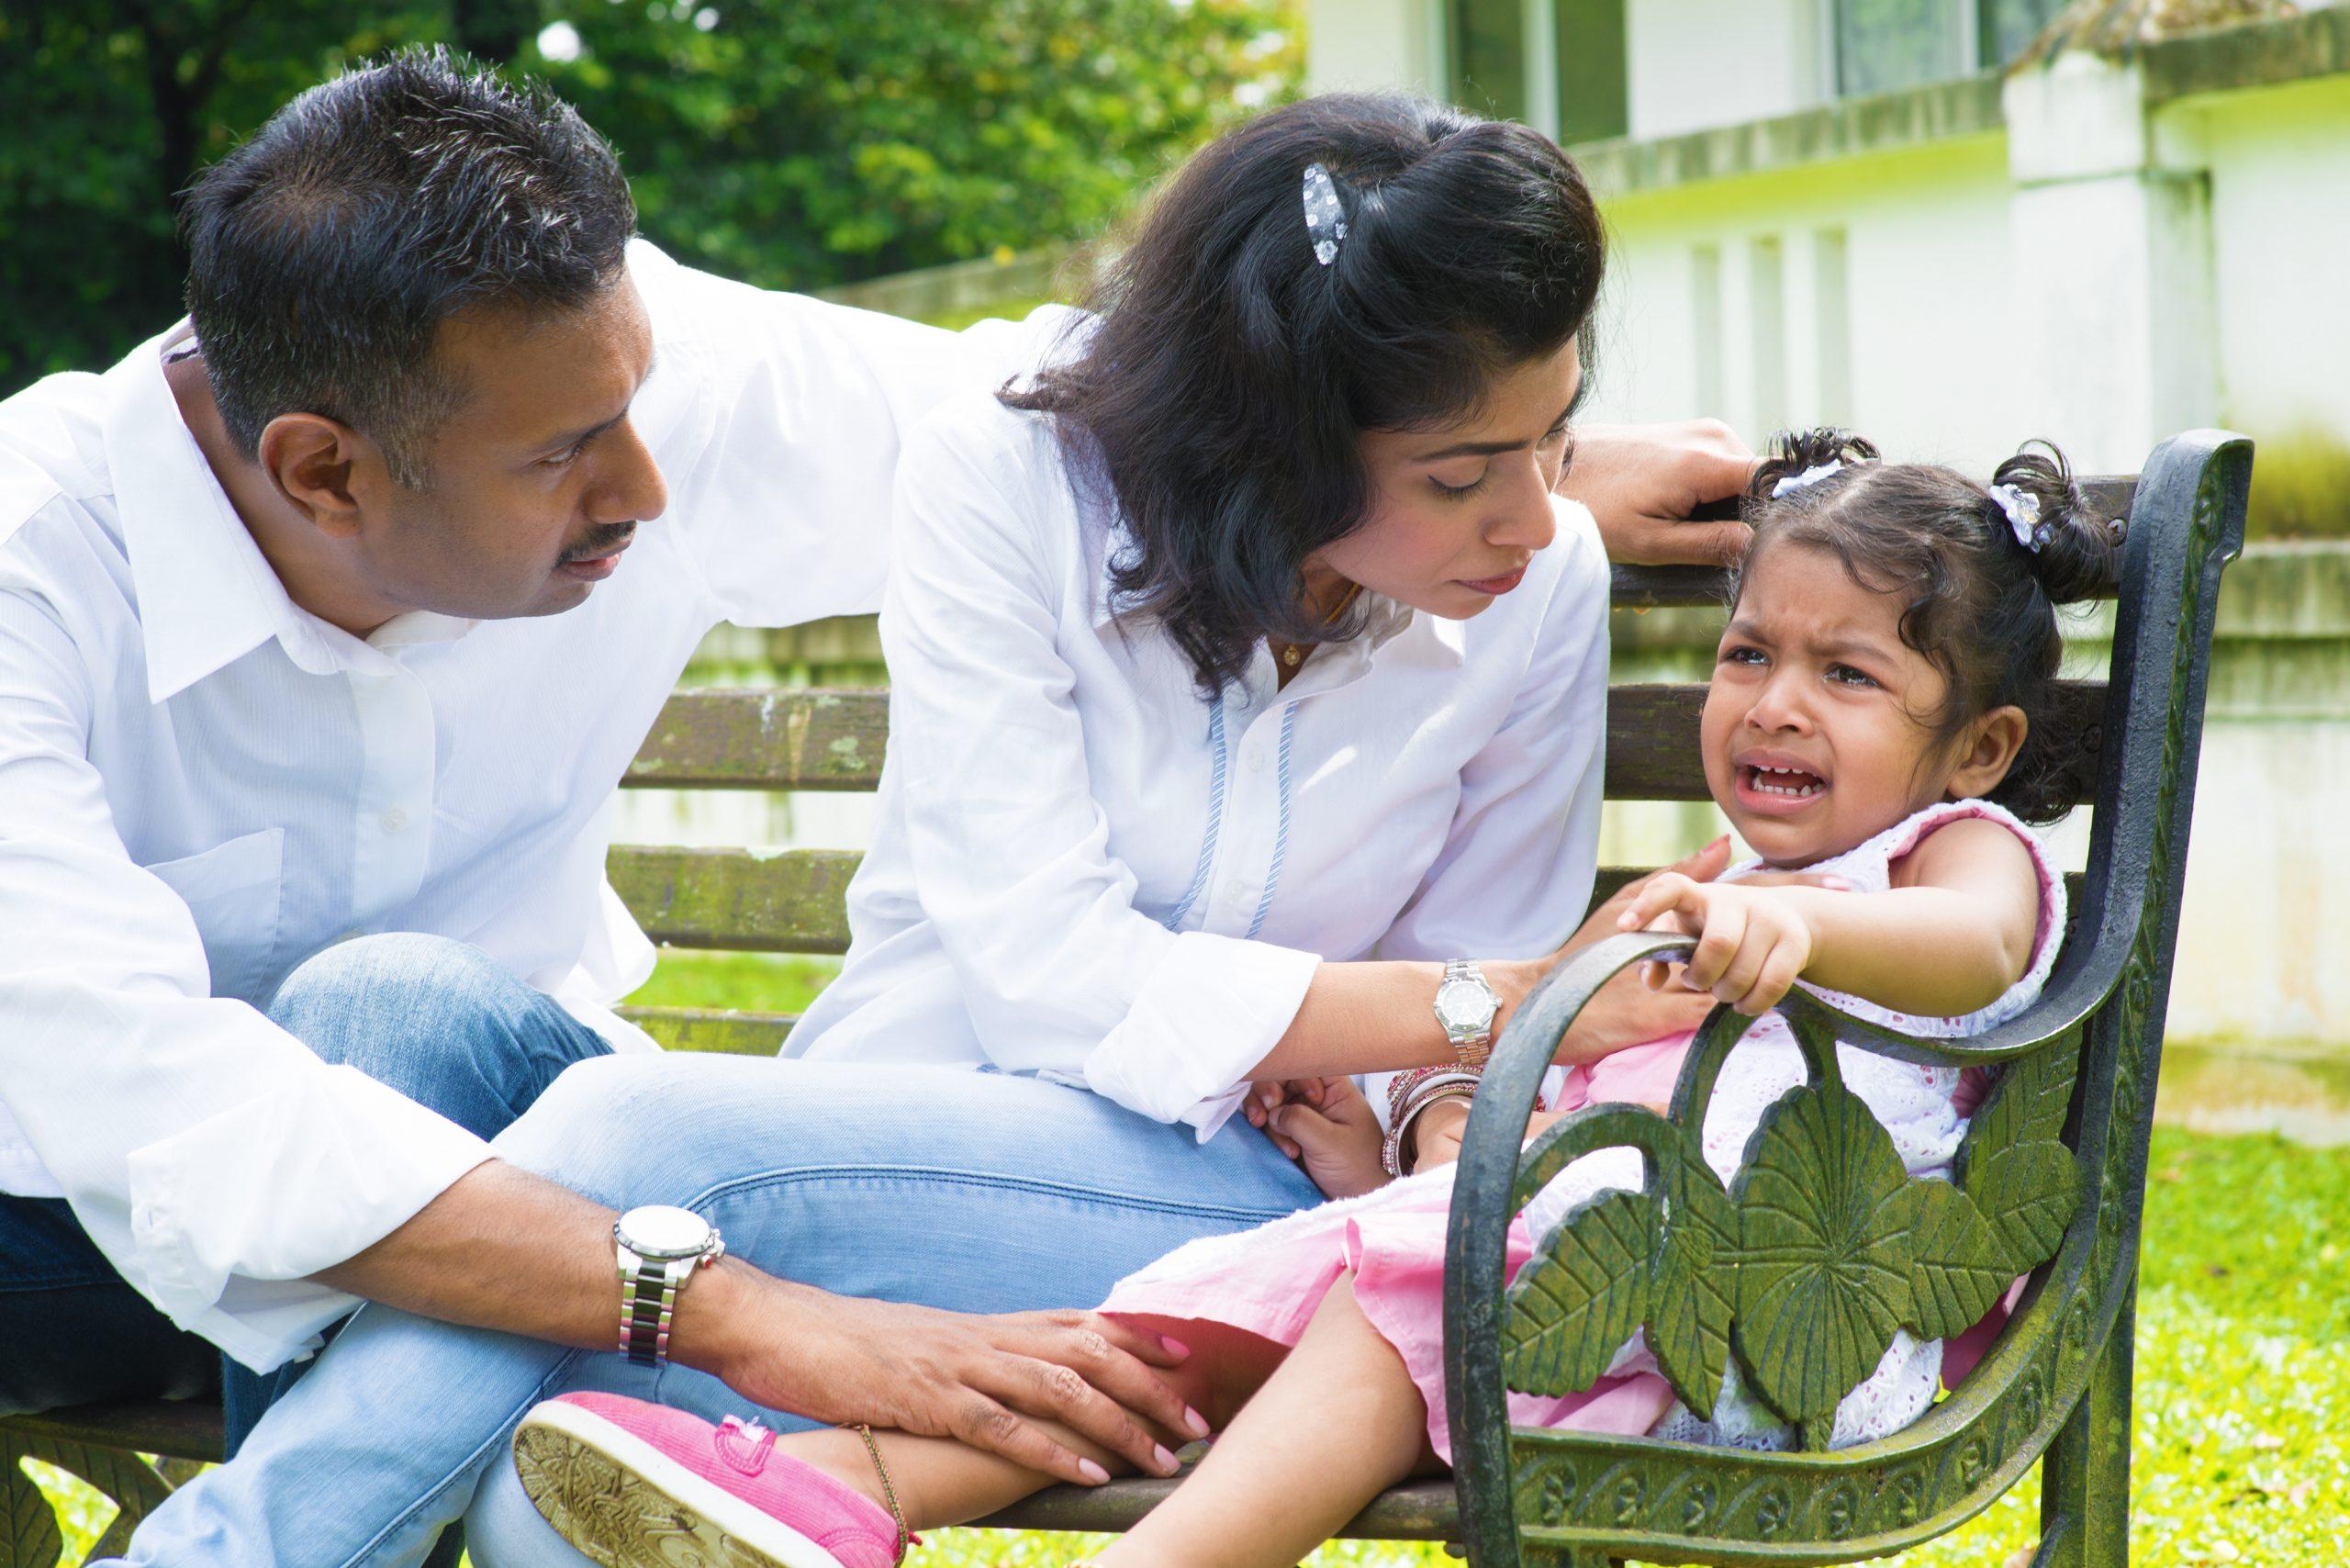 Helping Your Child Through a Temper Tantrum